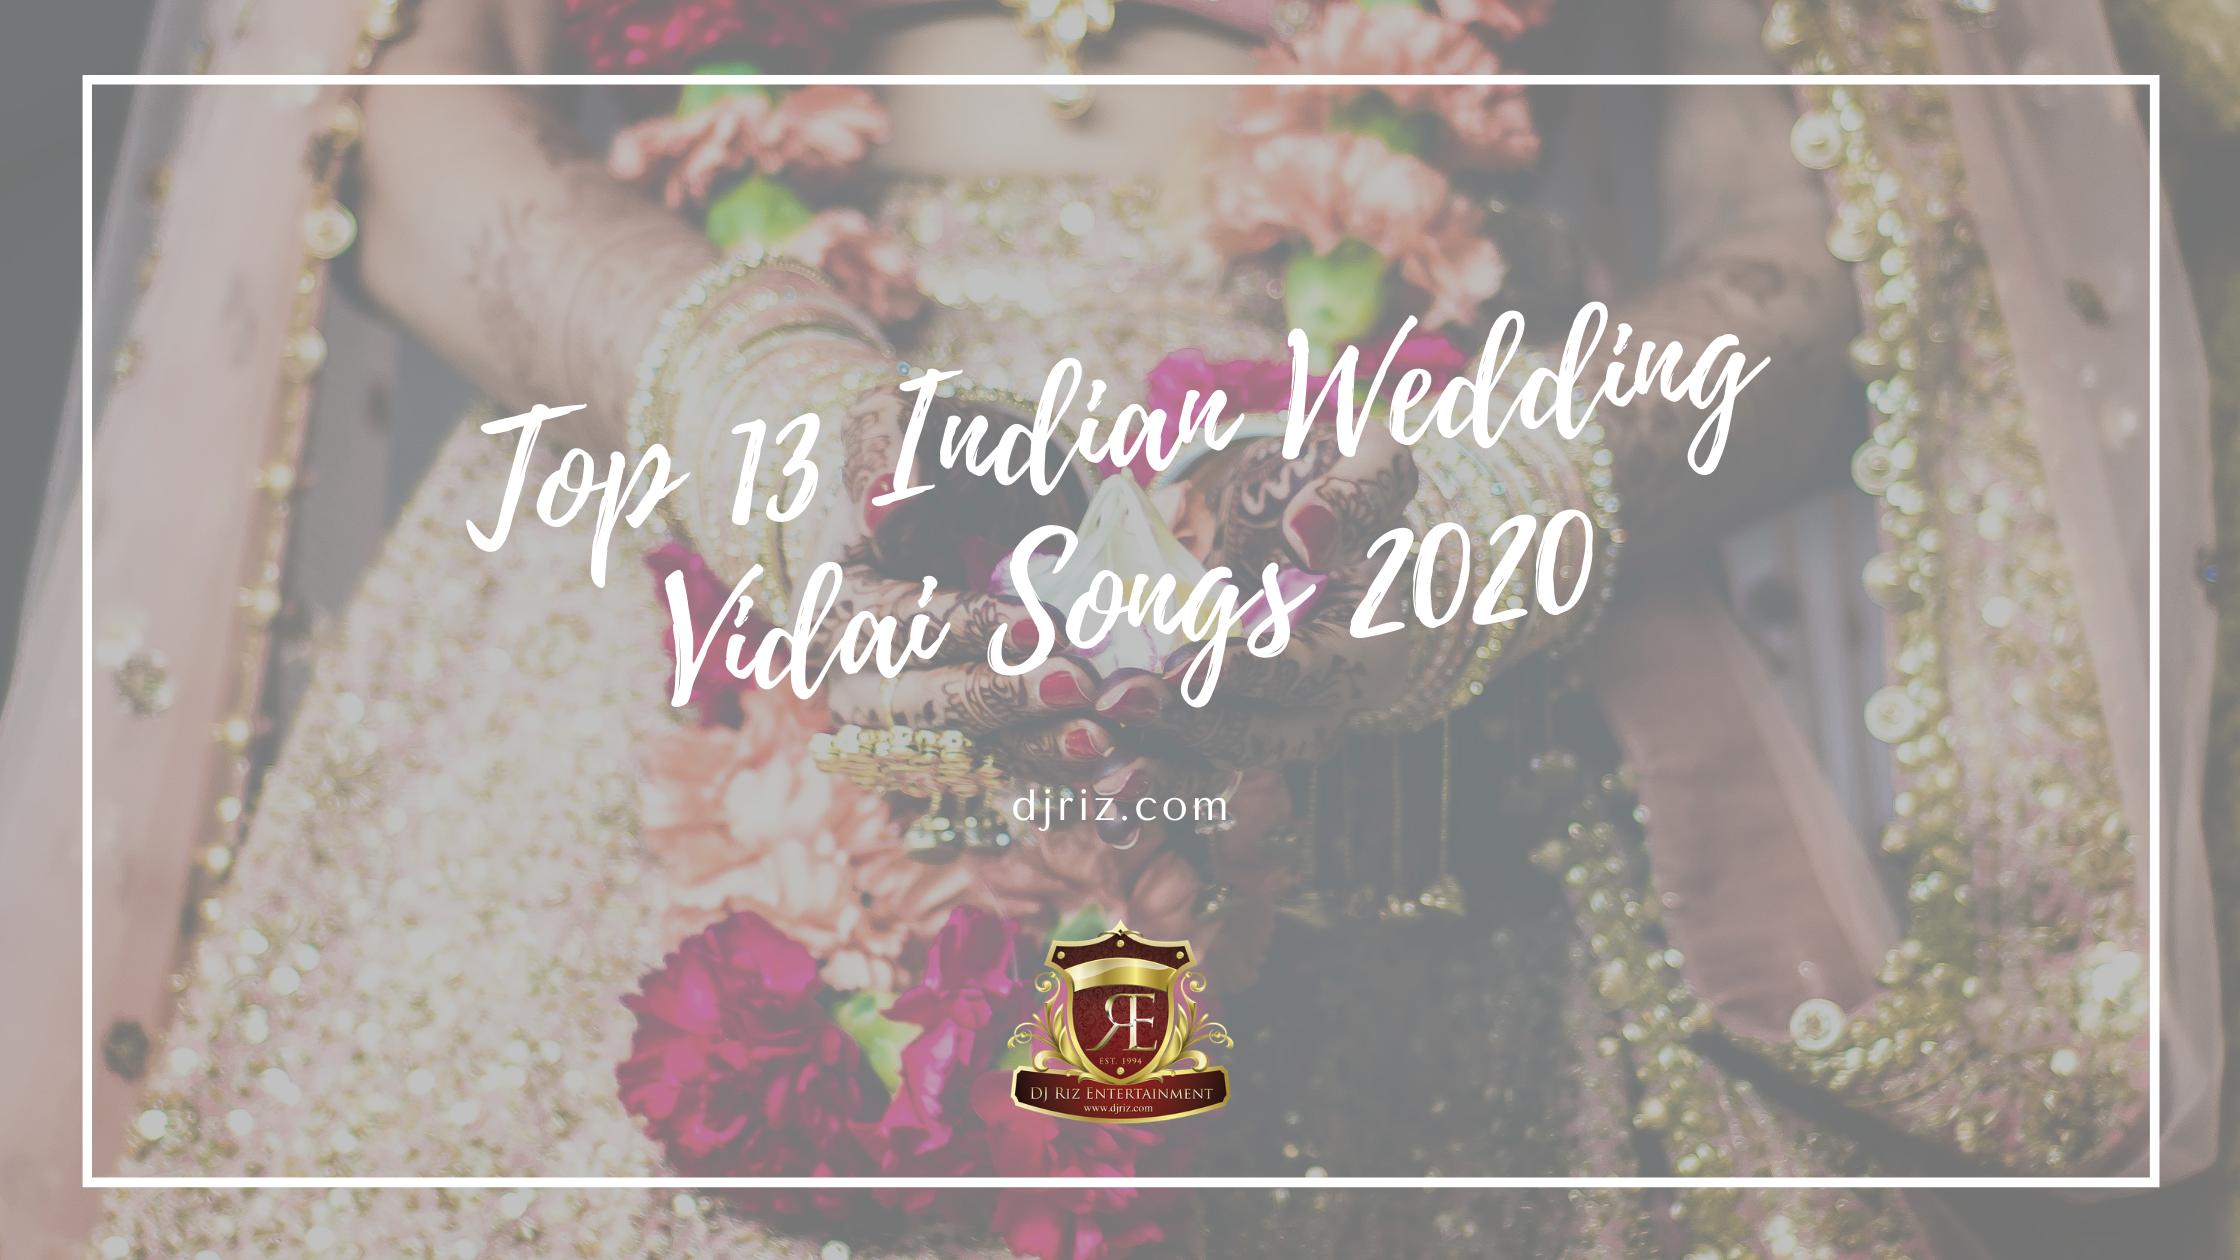 Top 13 Indian Wedding Vidai Songs 2020